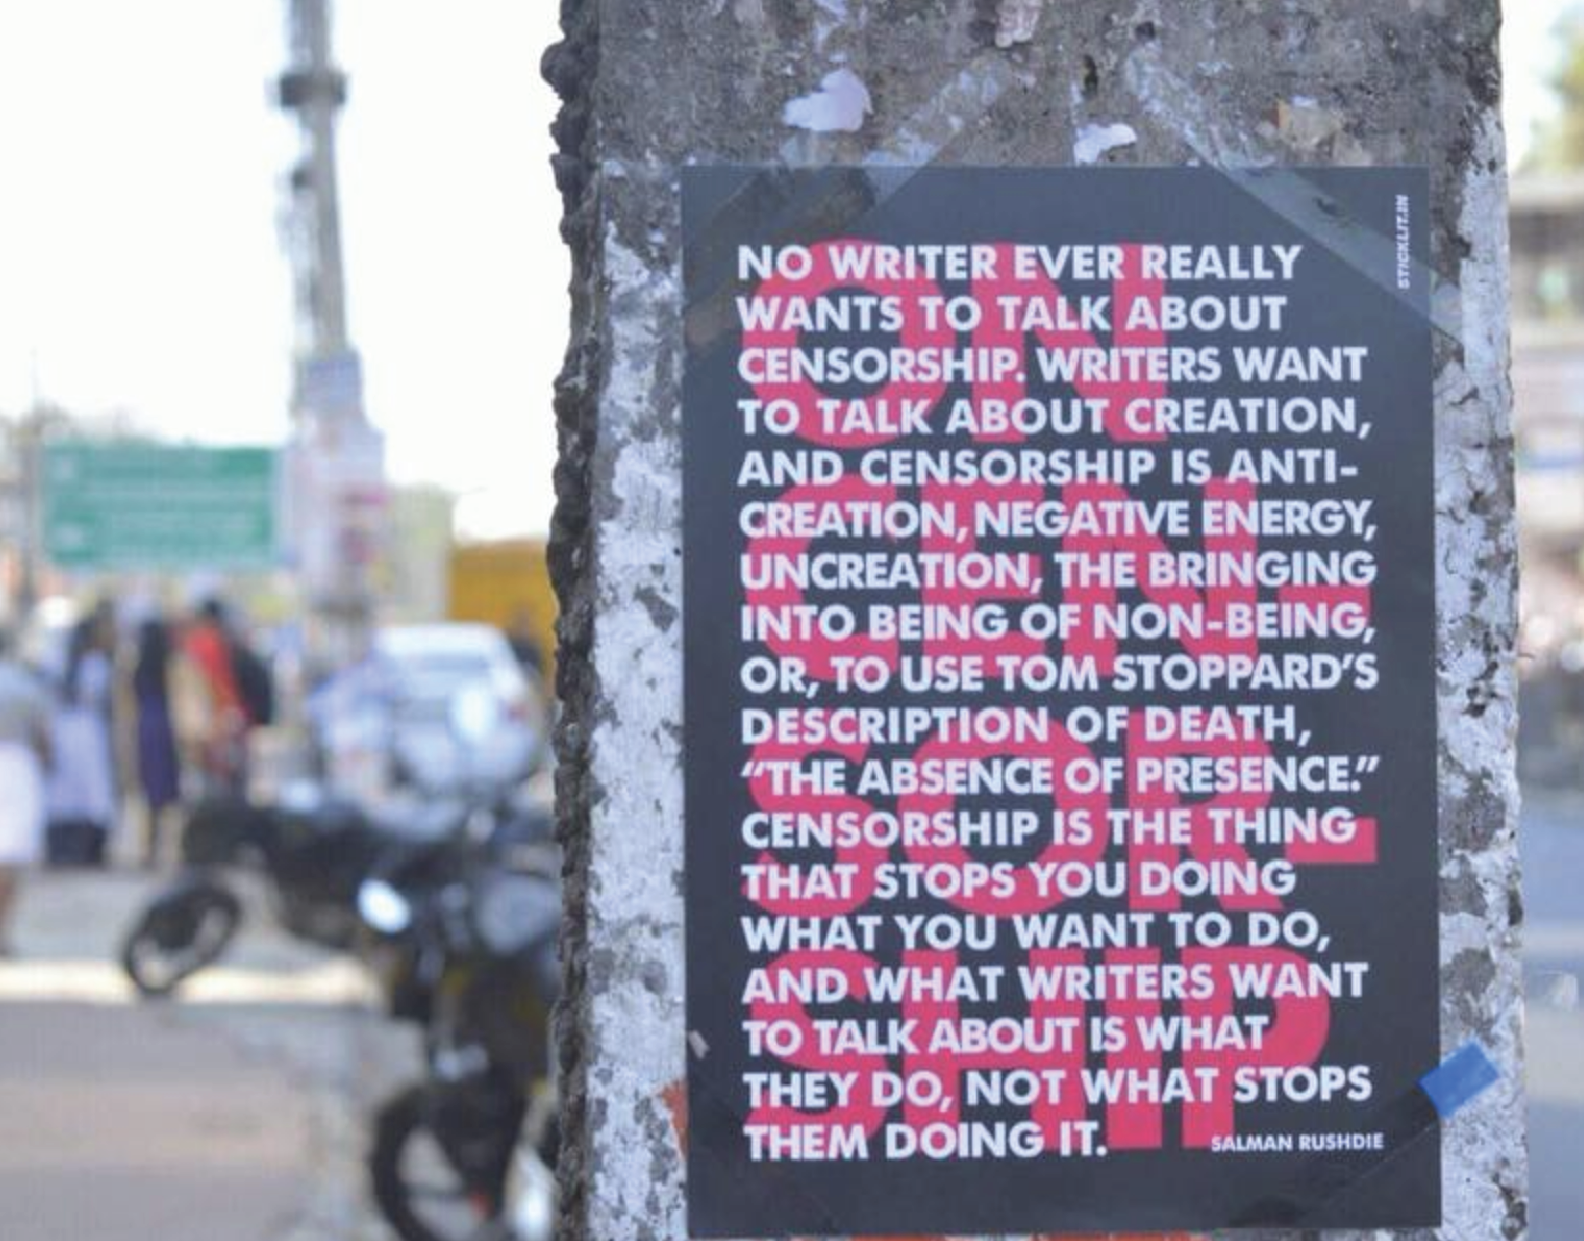 #StickLit μια βιβλιοθήκη διάσπαρτη στους δημόσιους χώρους της Ινδίας